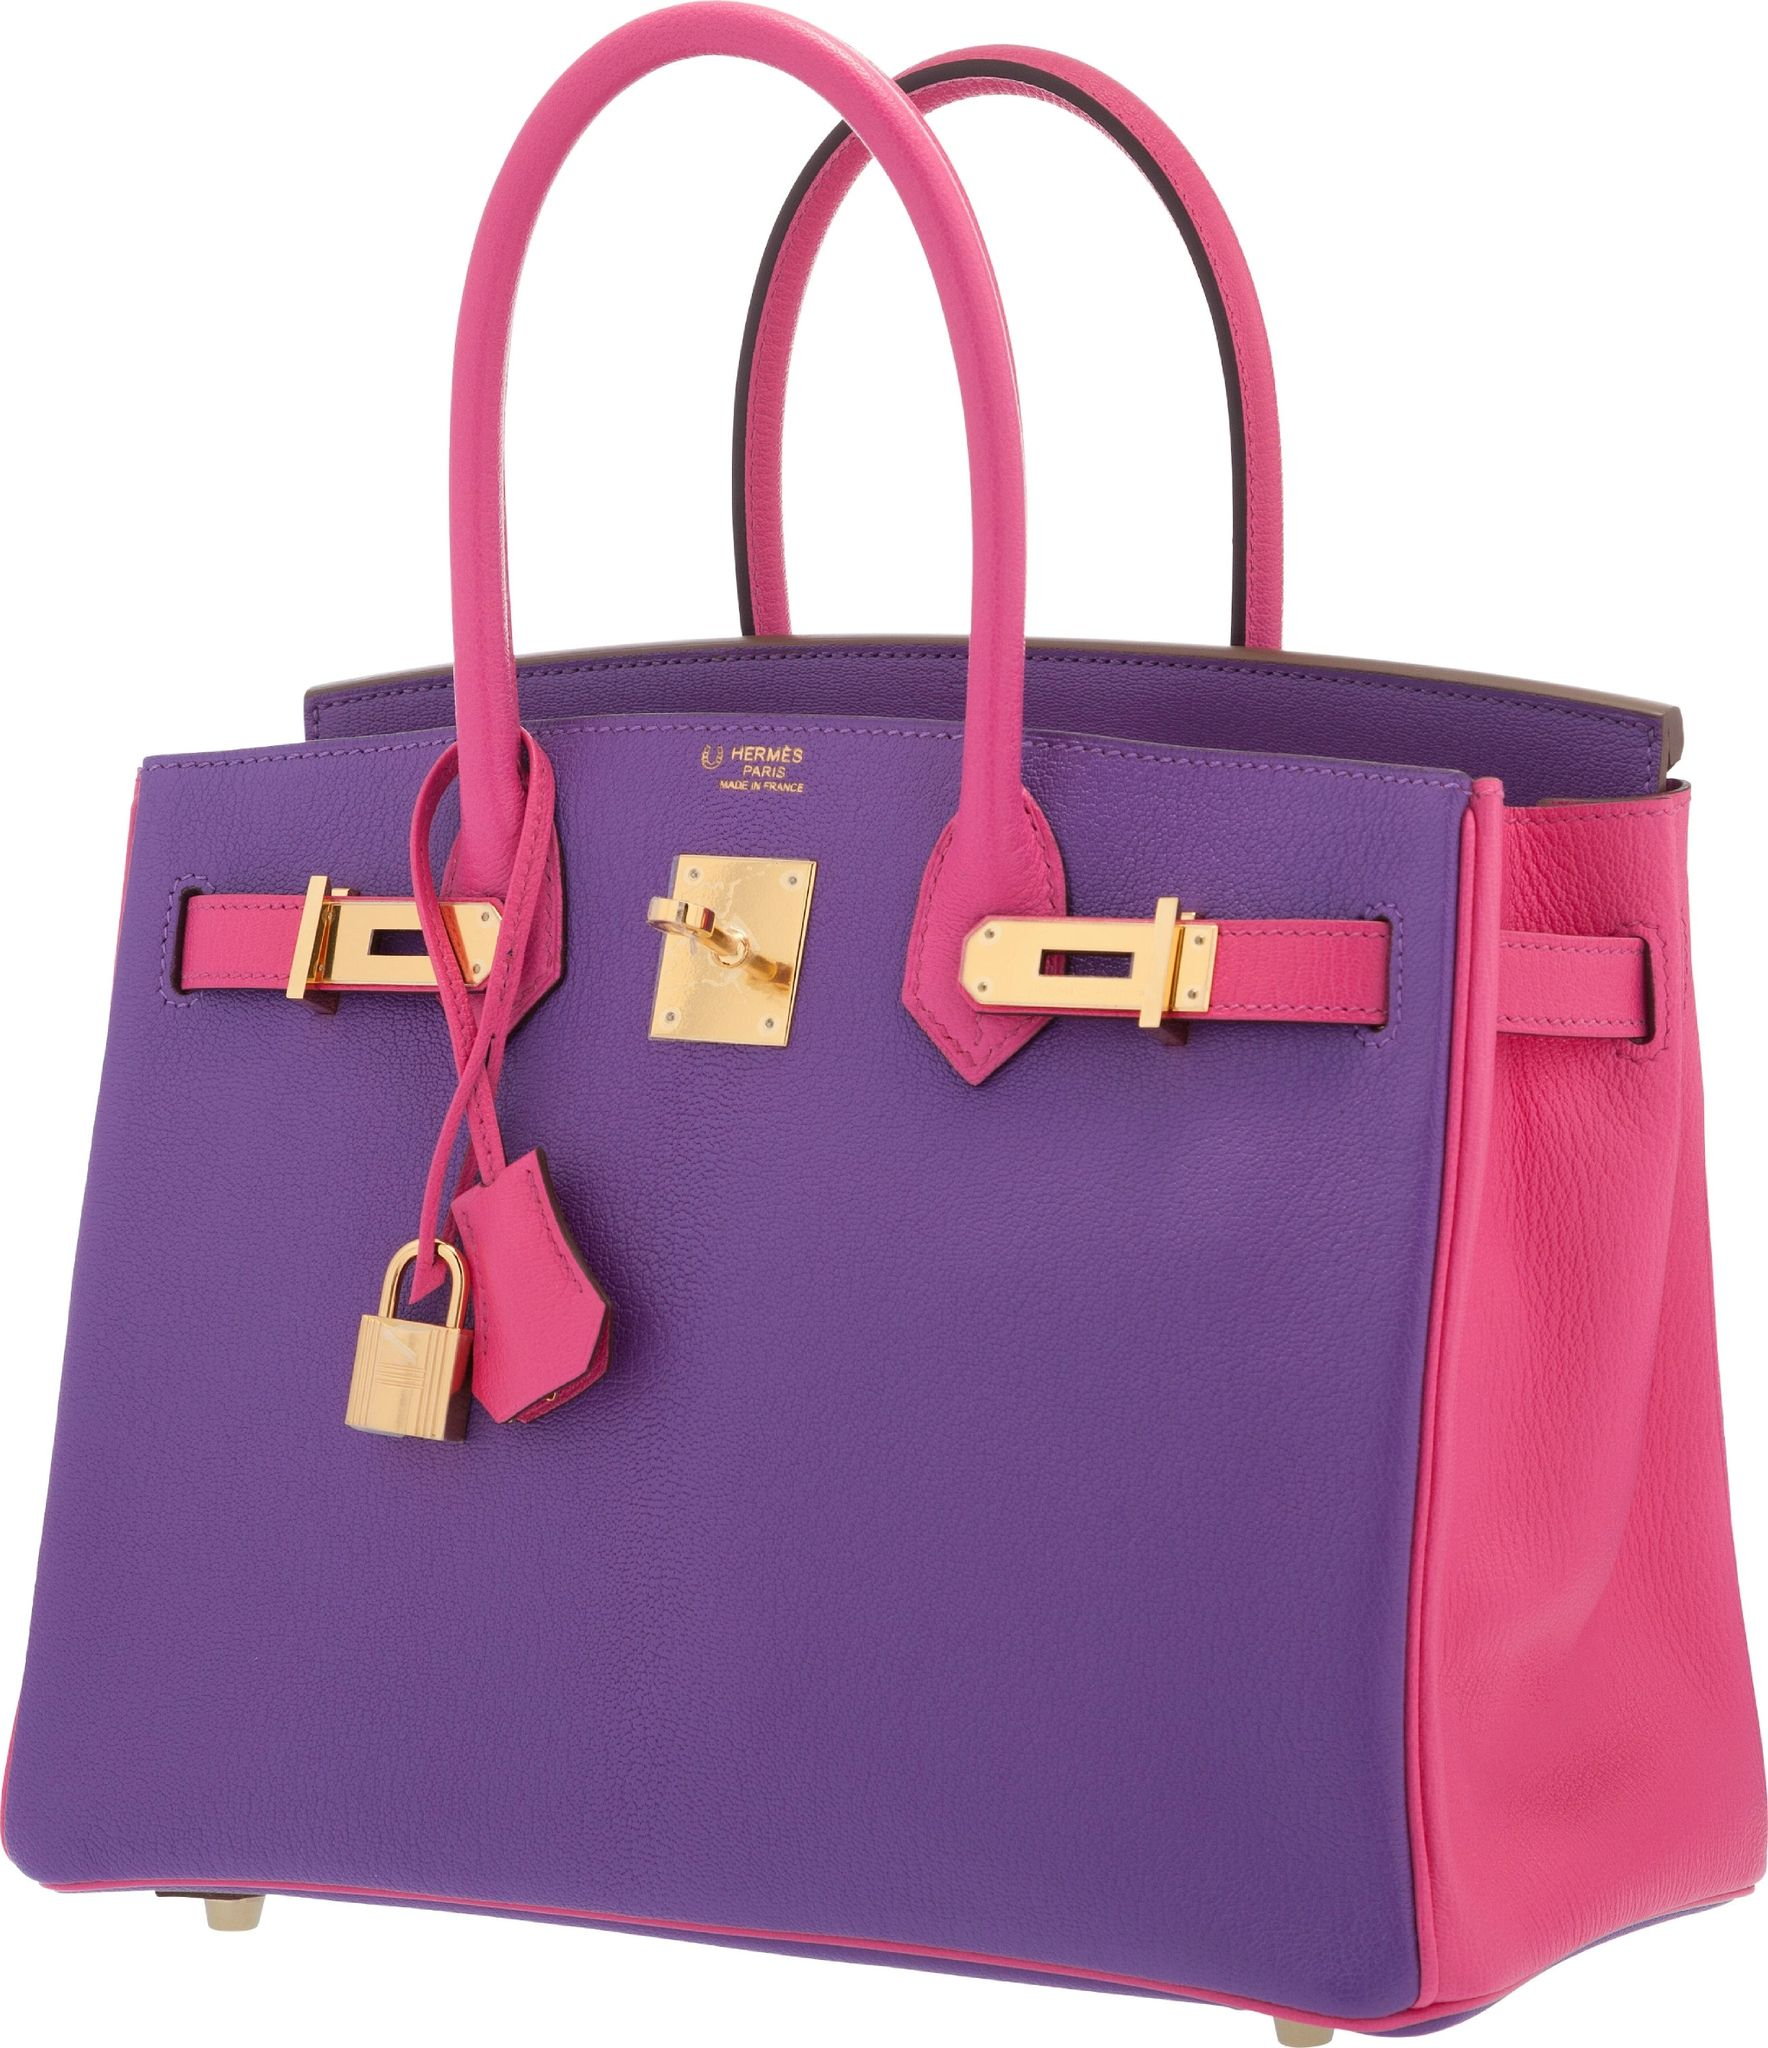 6418dd7e77 Hermès Special Order Horseshoe 30cm Parme   Rose Tyrien Chevre Leather Birkin  Bag with Gold Hardware